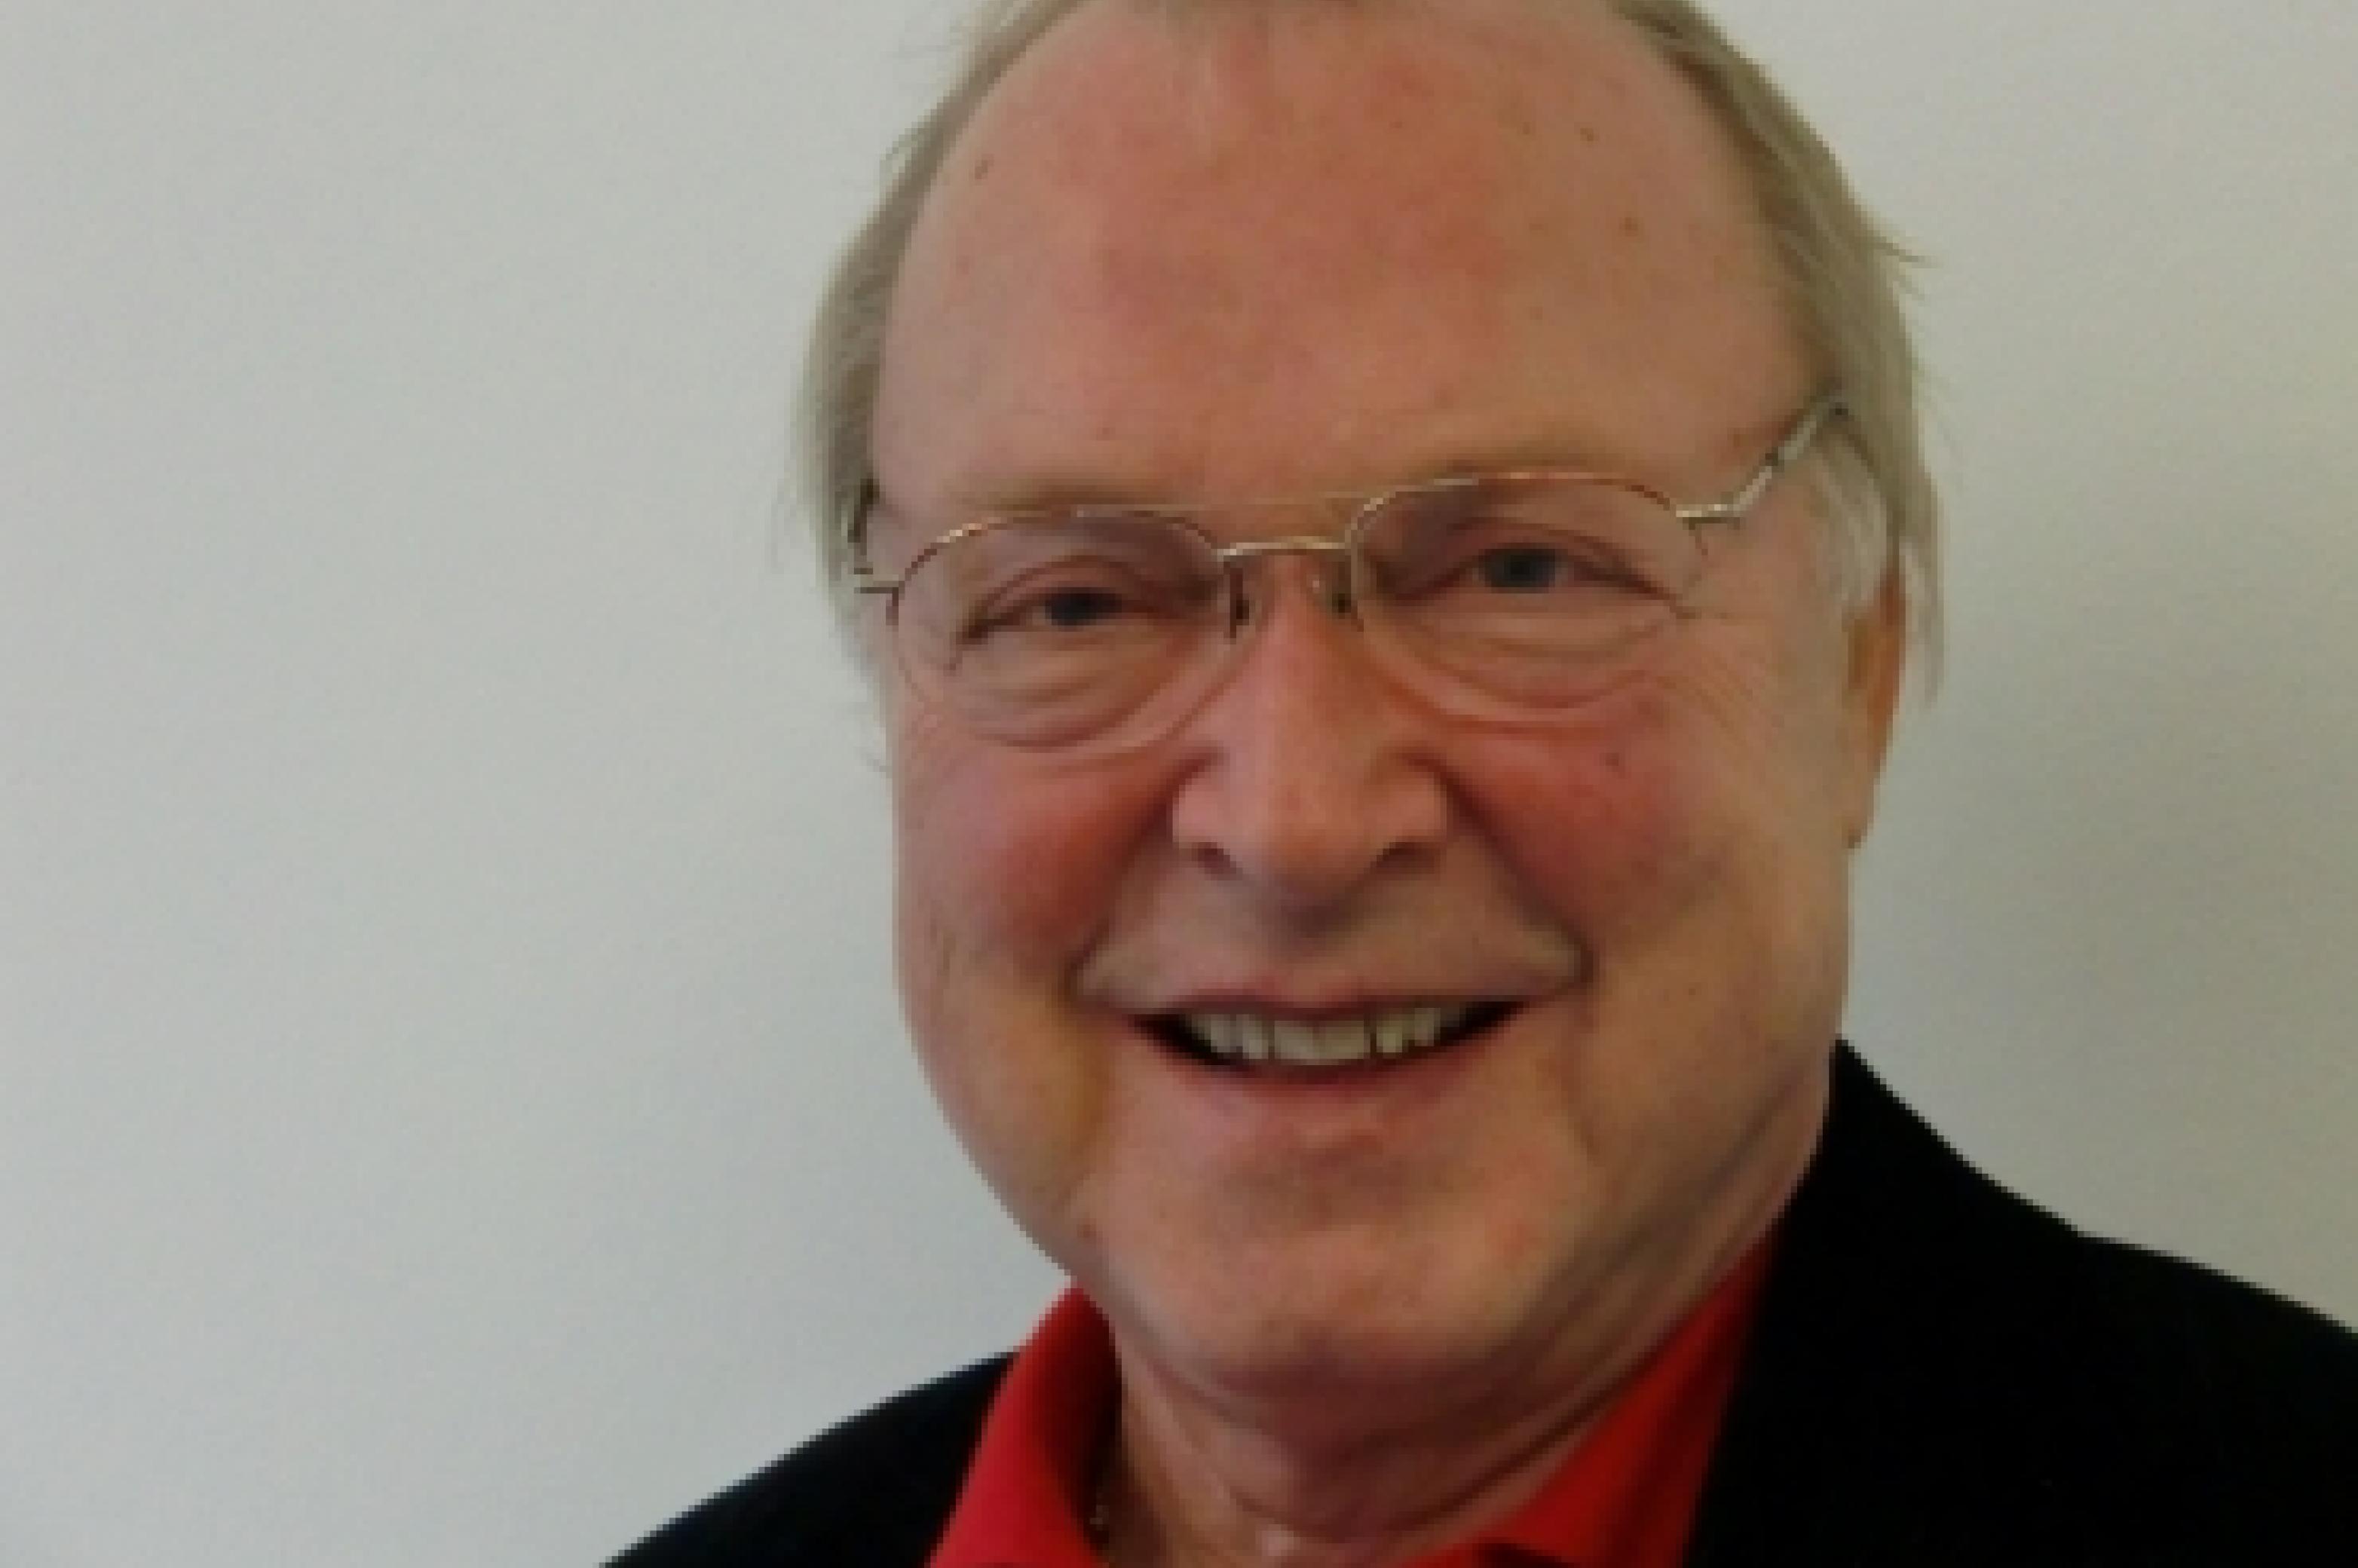 Dr. Bertil Oser, Bernkastel-Kues